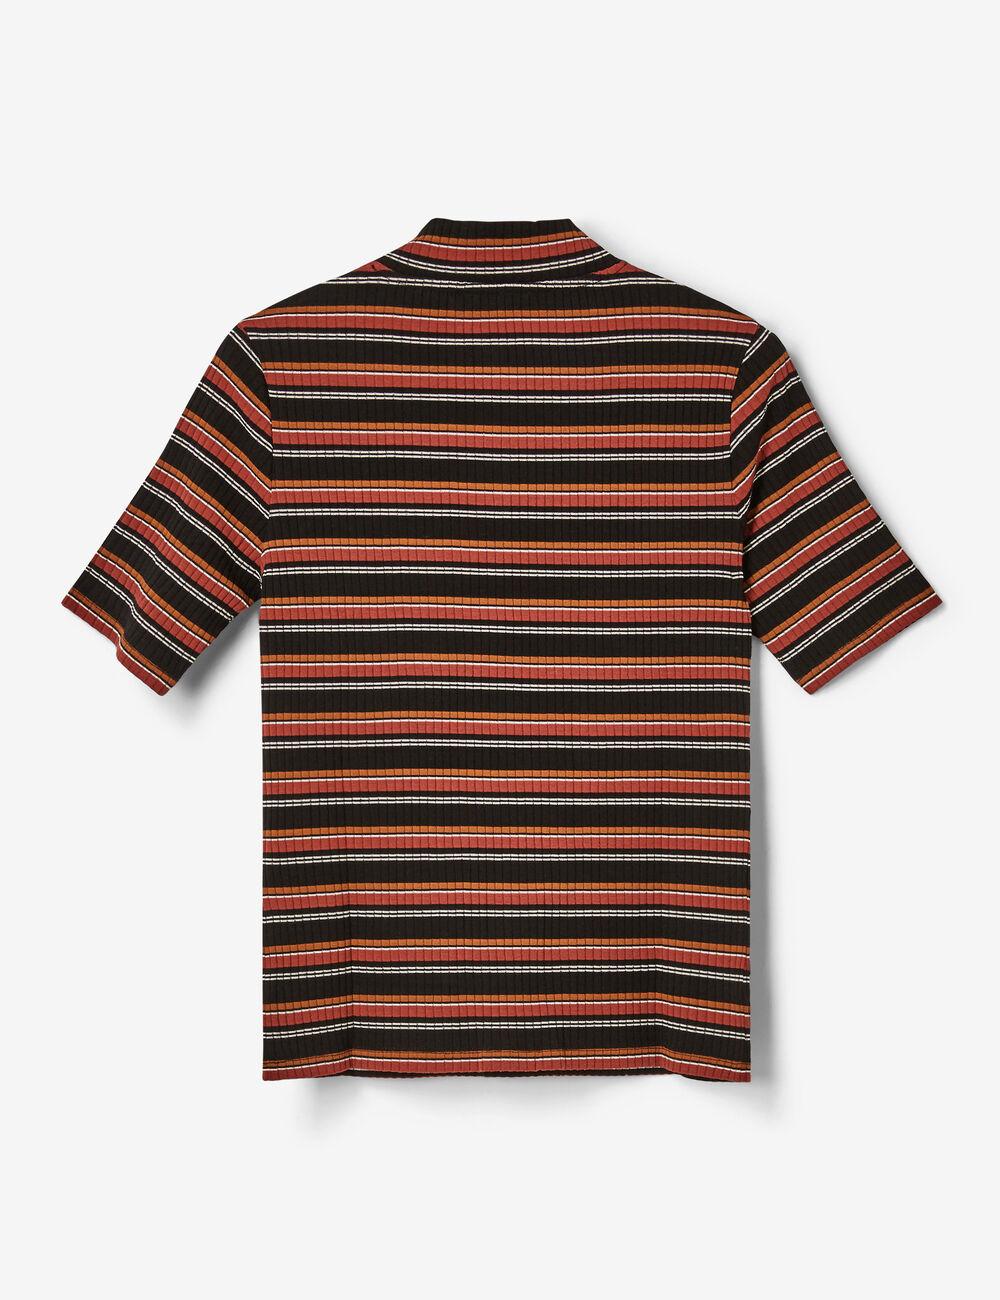 tee shirt ray zipp noir blanc rouille et camel femme. Black Bedroom Furniture Sets. Home Design Ideas